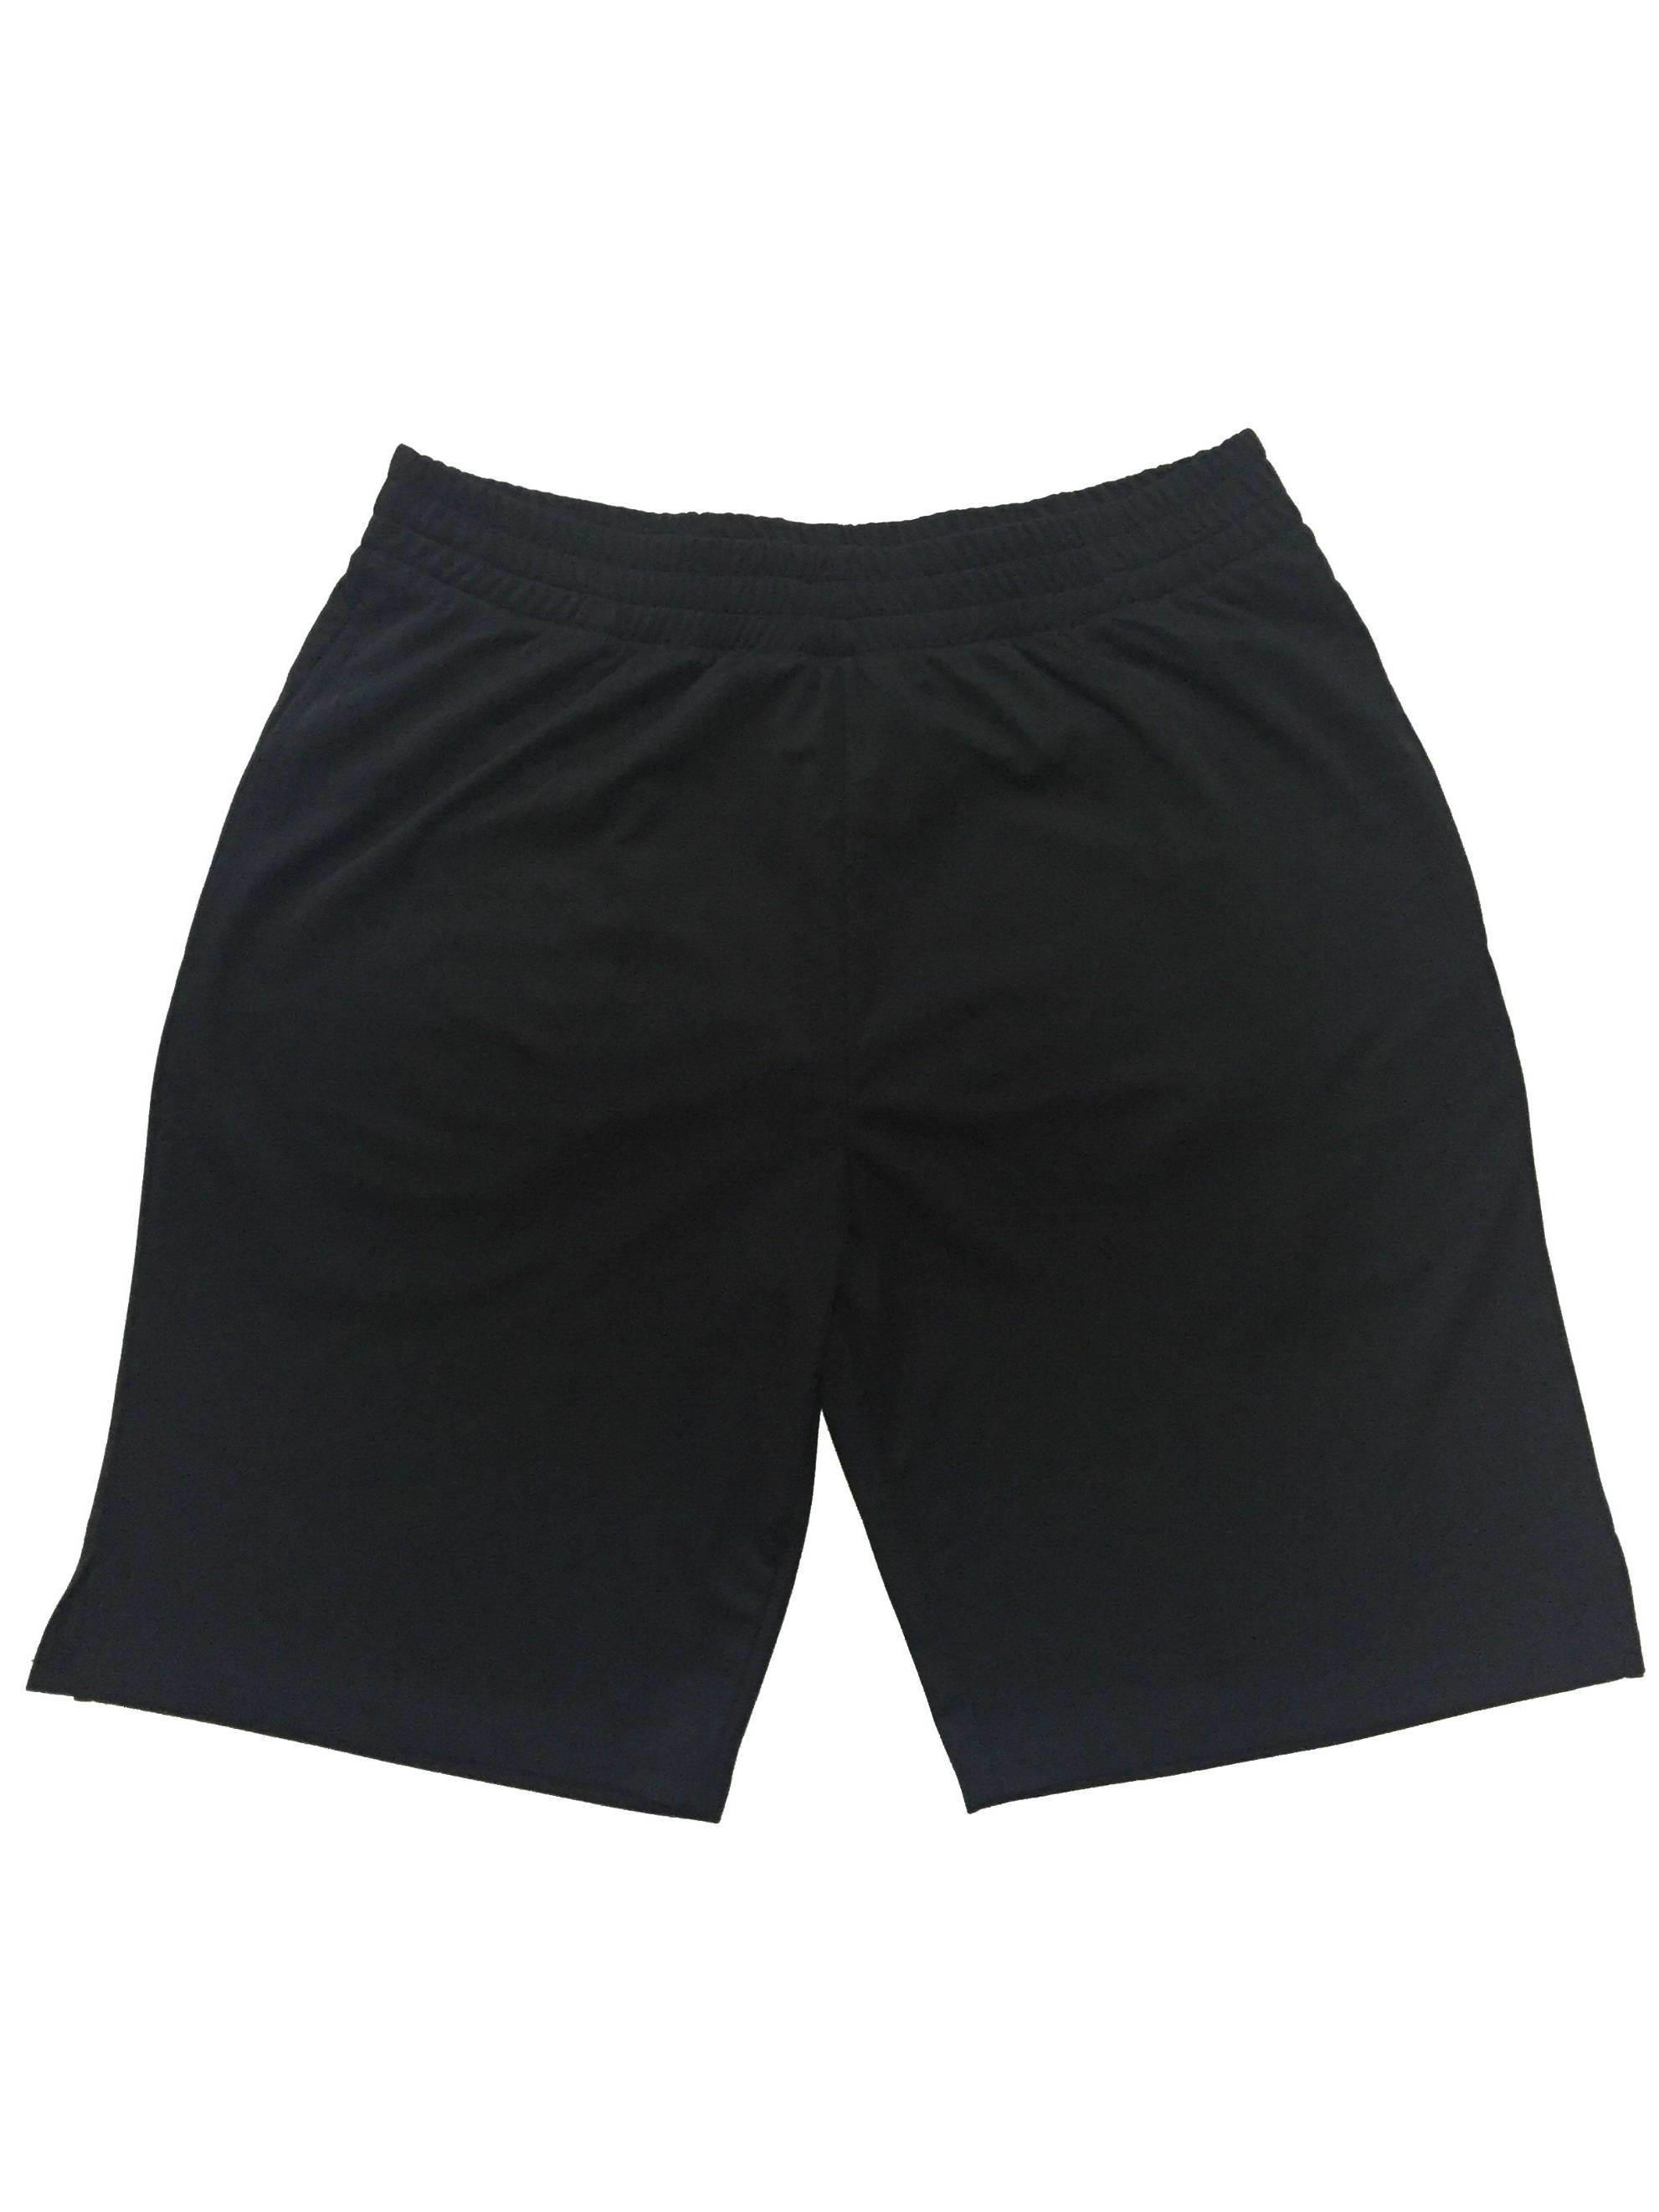 Men Quickly Dry Yoga Suit/ Mens Short Sleeve